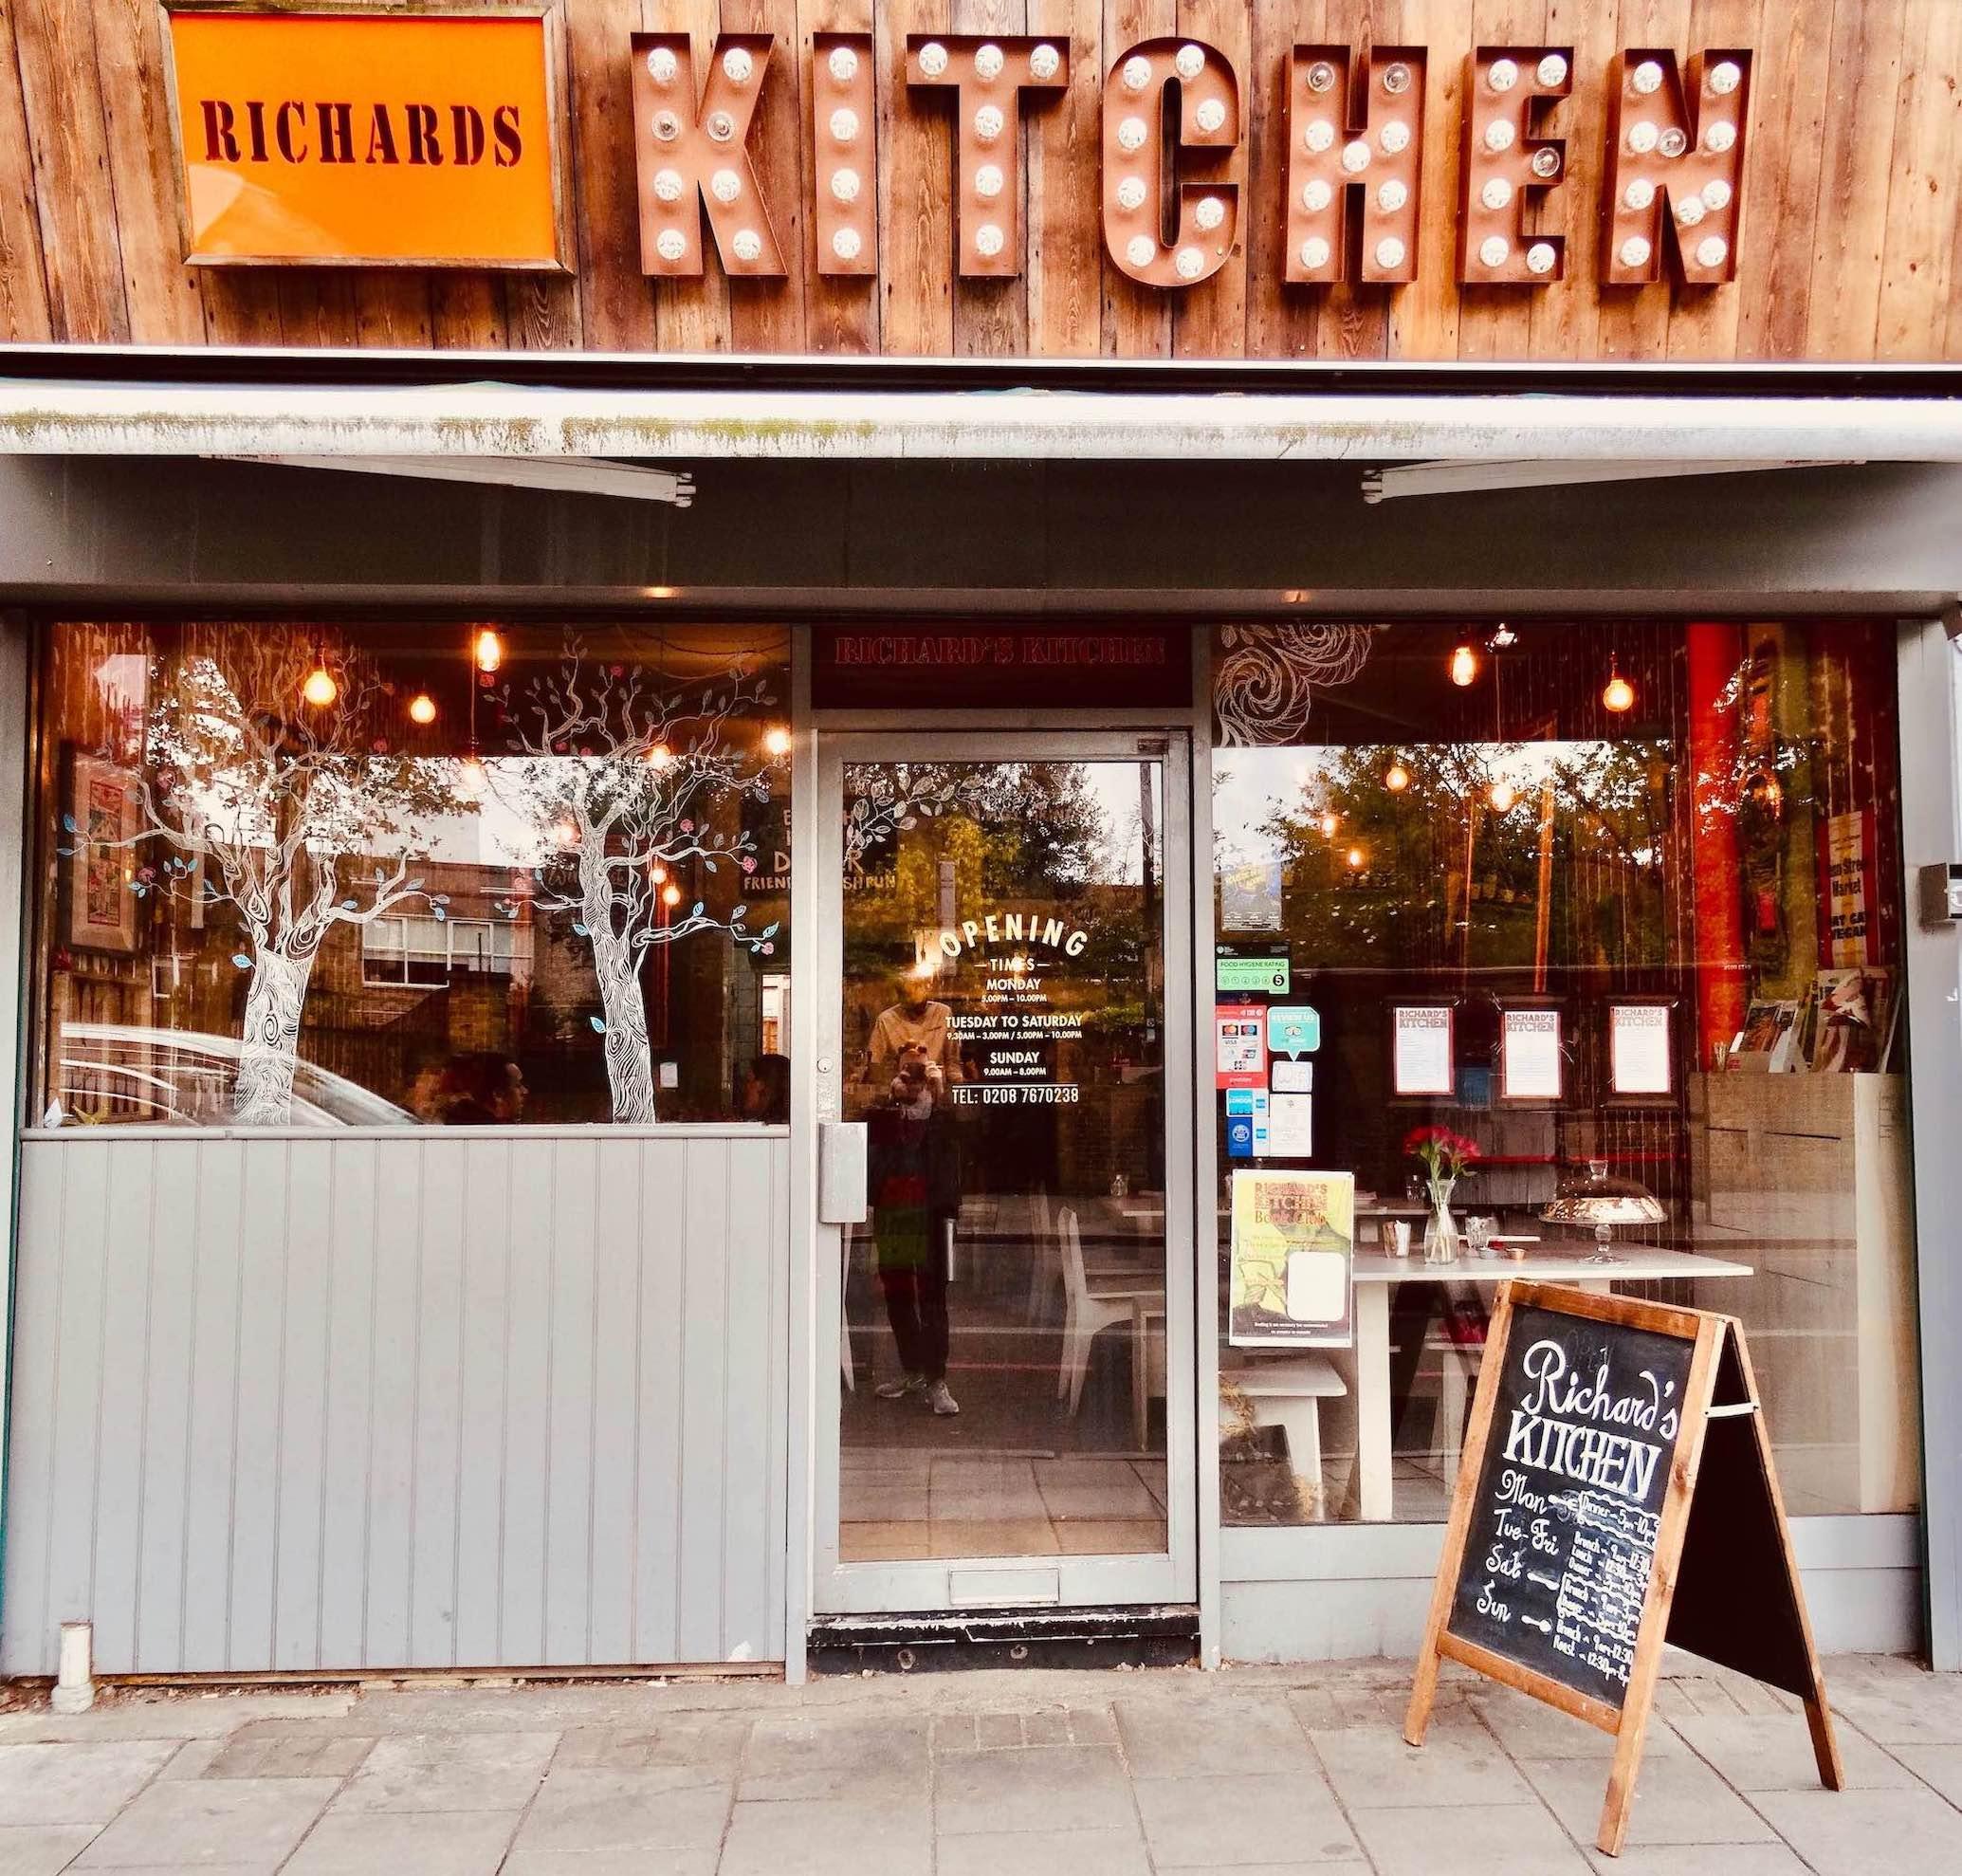 Richard's Kitchen Tooting Bec London